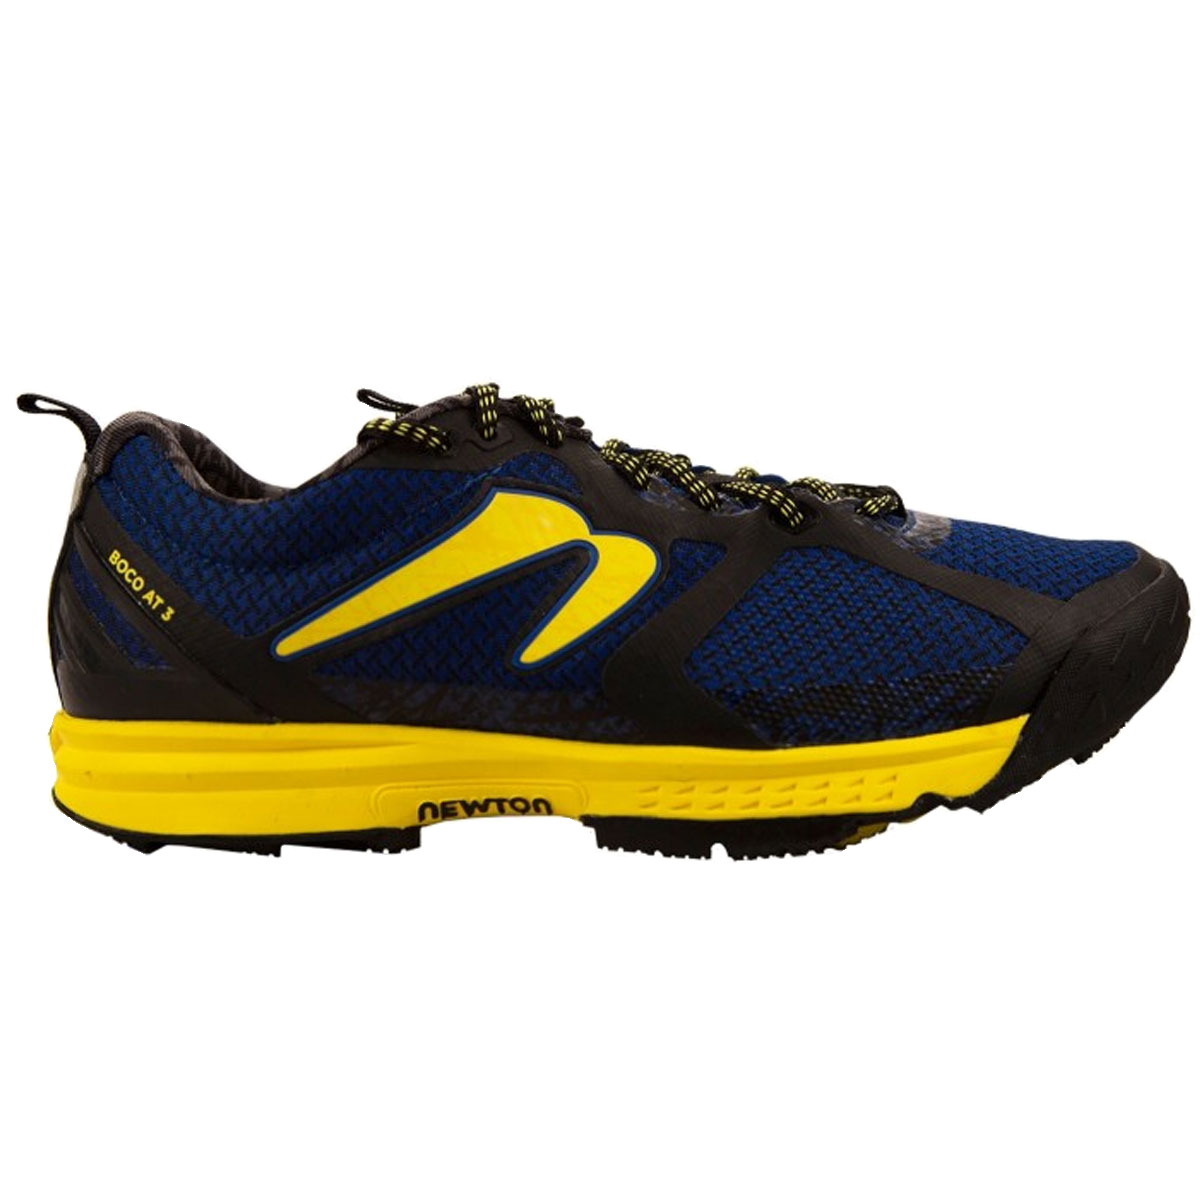 Newton Boco AT III Herren Trail Schuhe Laufschuhe Sportschuhe Turnschuhe M005117